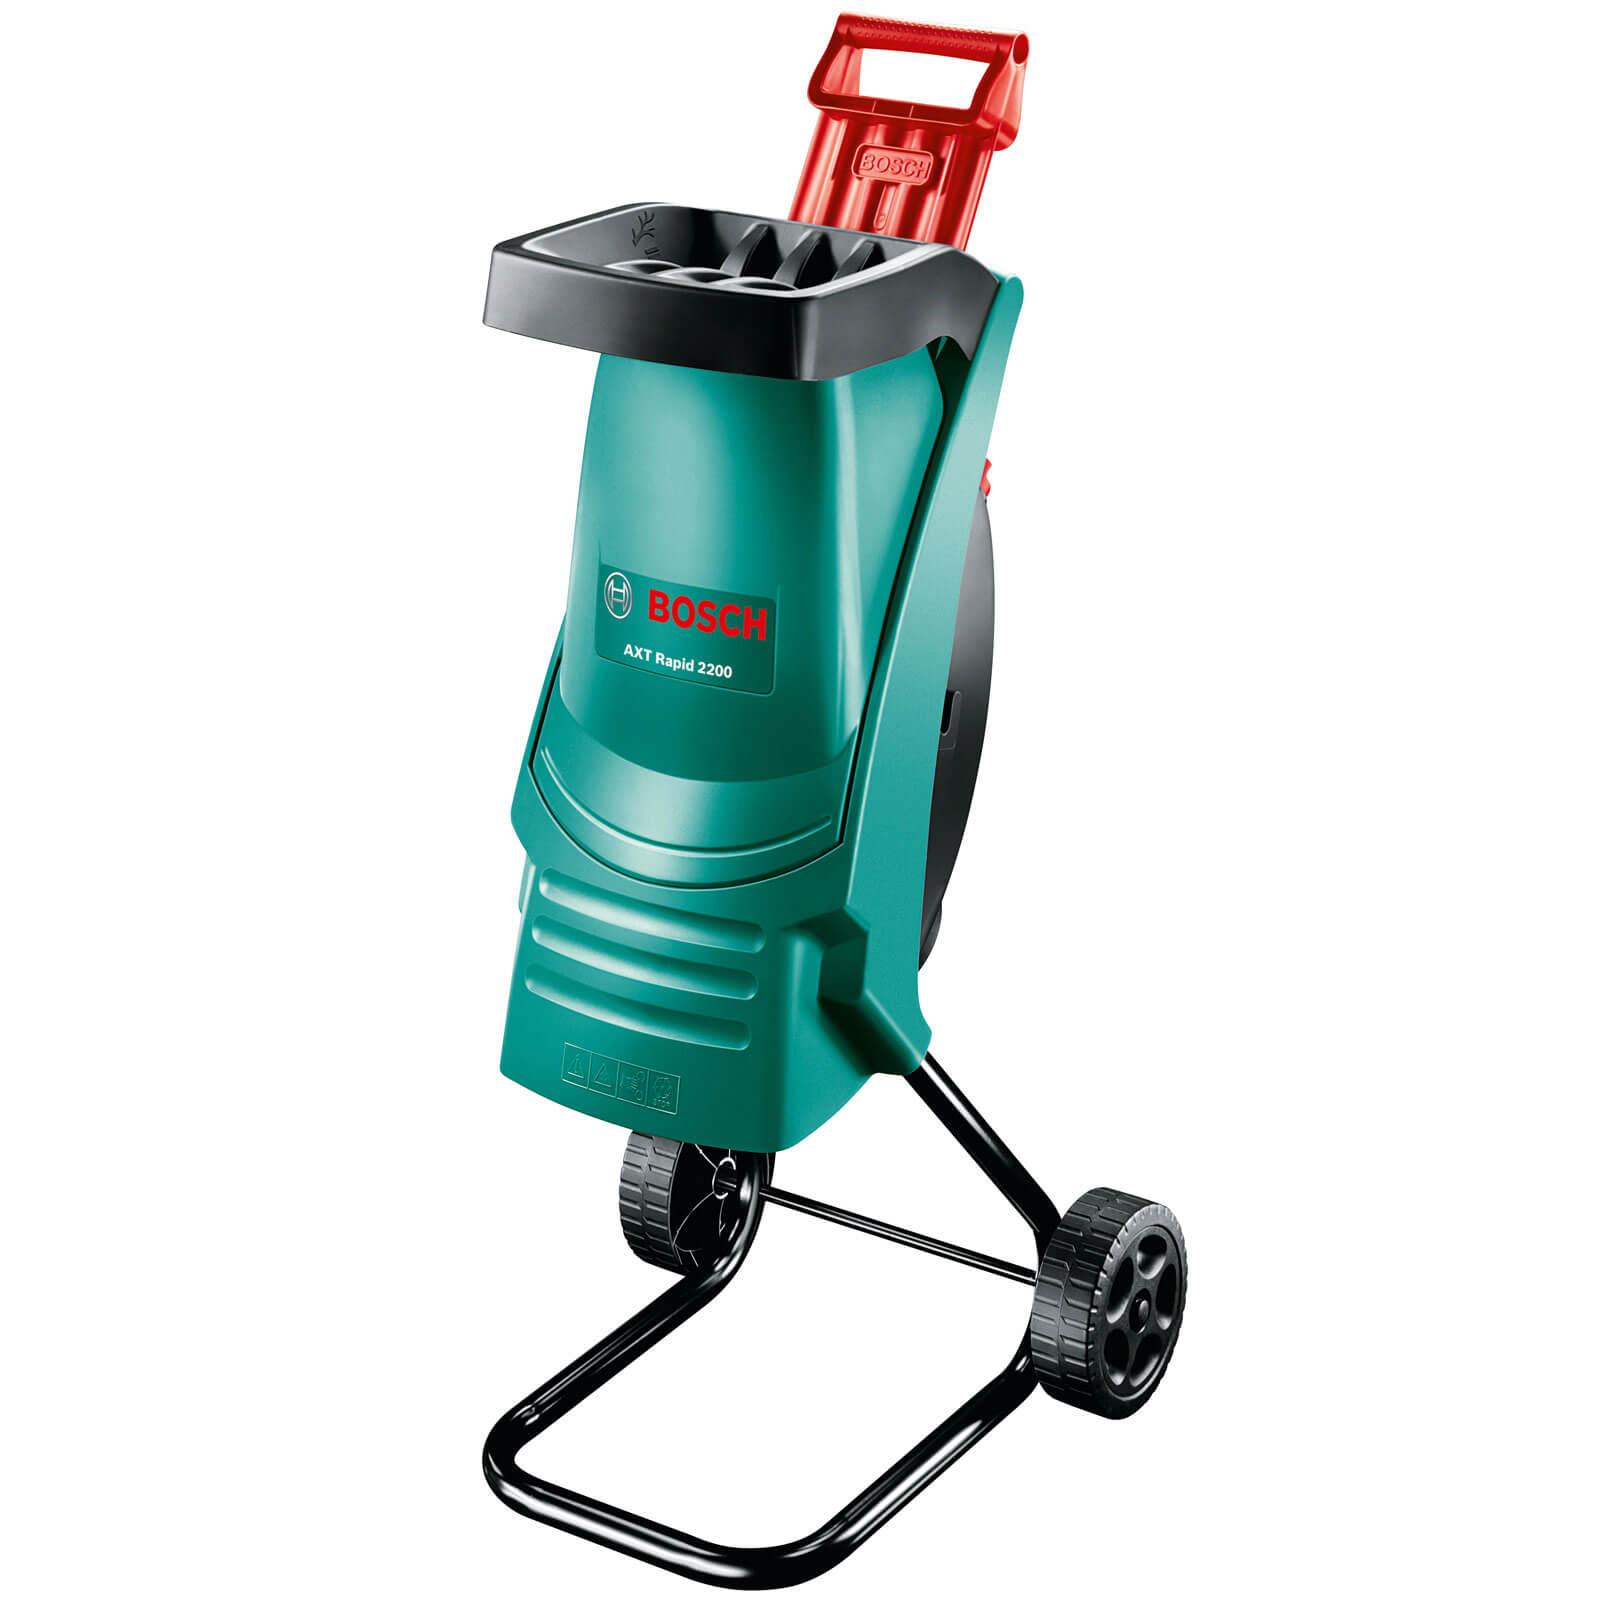 Bosch AXT RAPID 2200 Garden Shredder Max 40mm Capacity 2200w 240v Plus FREE Spare Blade